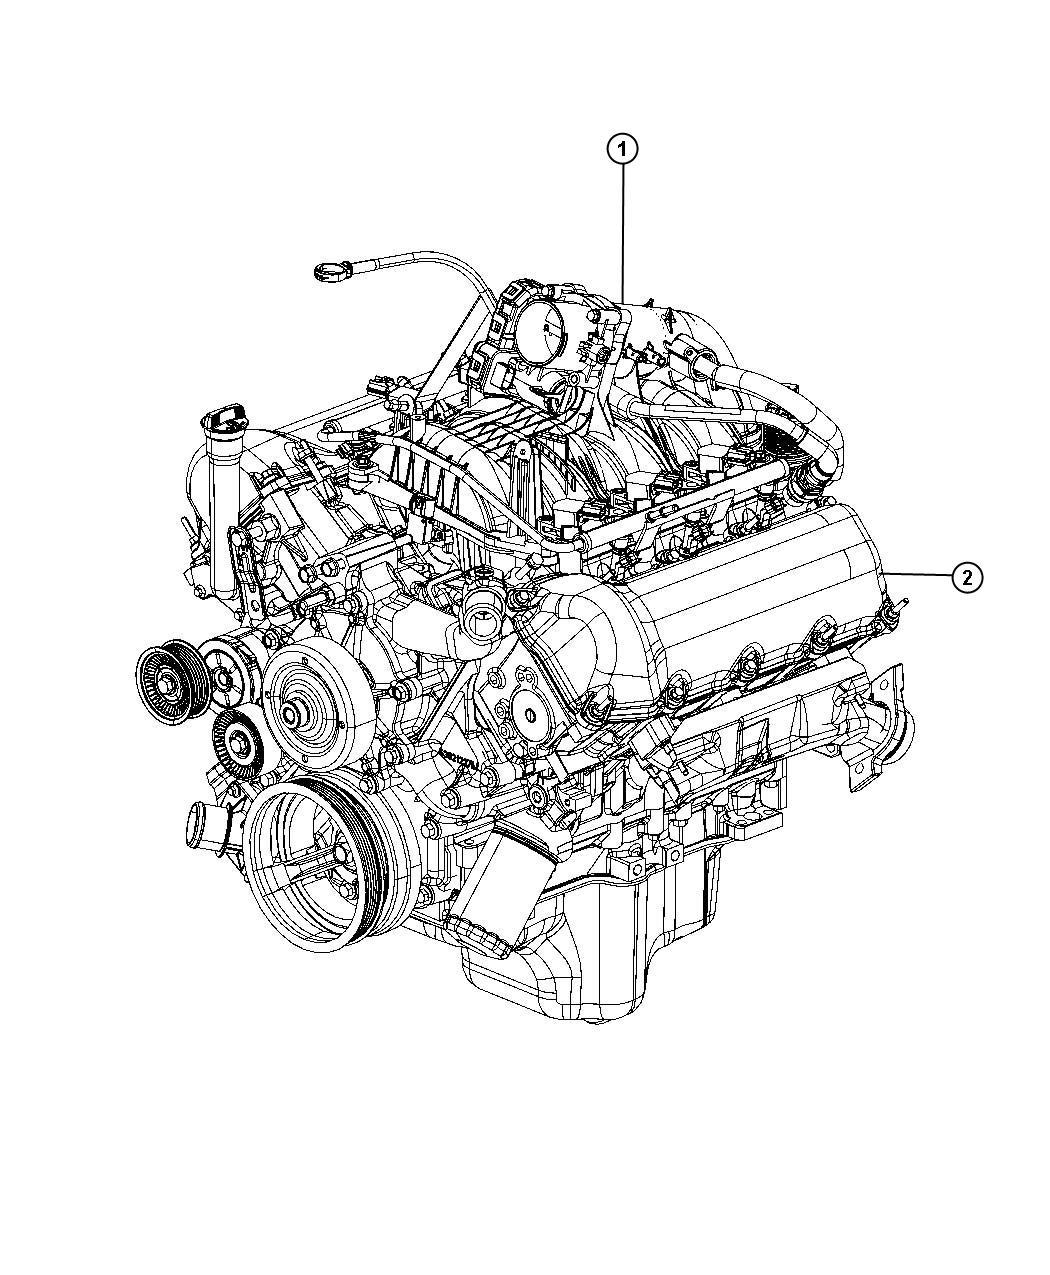 2008 Dodge Nitro Engine. Long block. Remanufactured